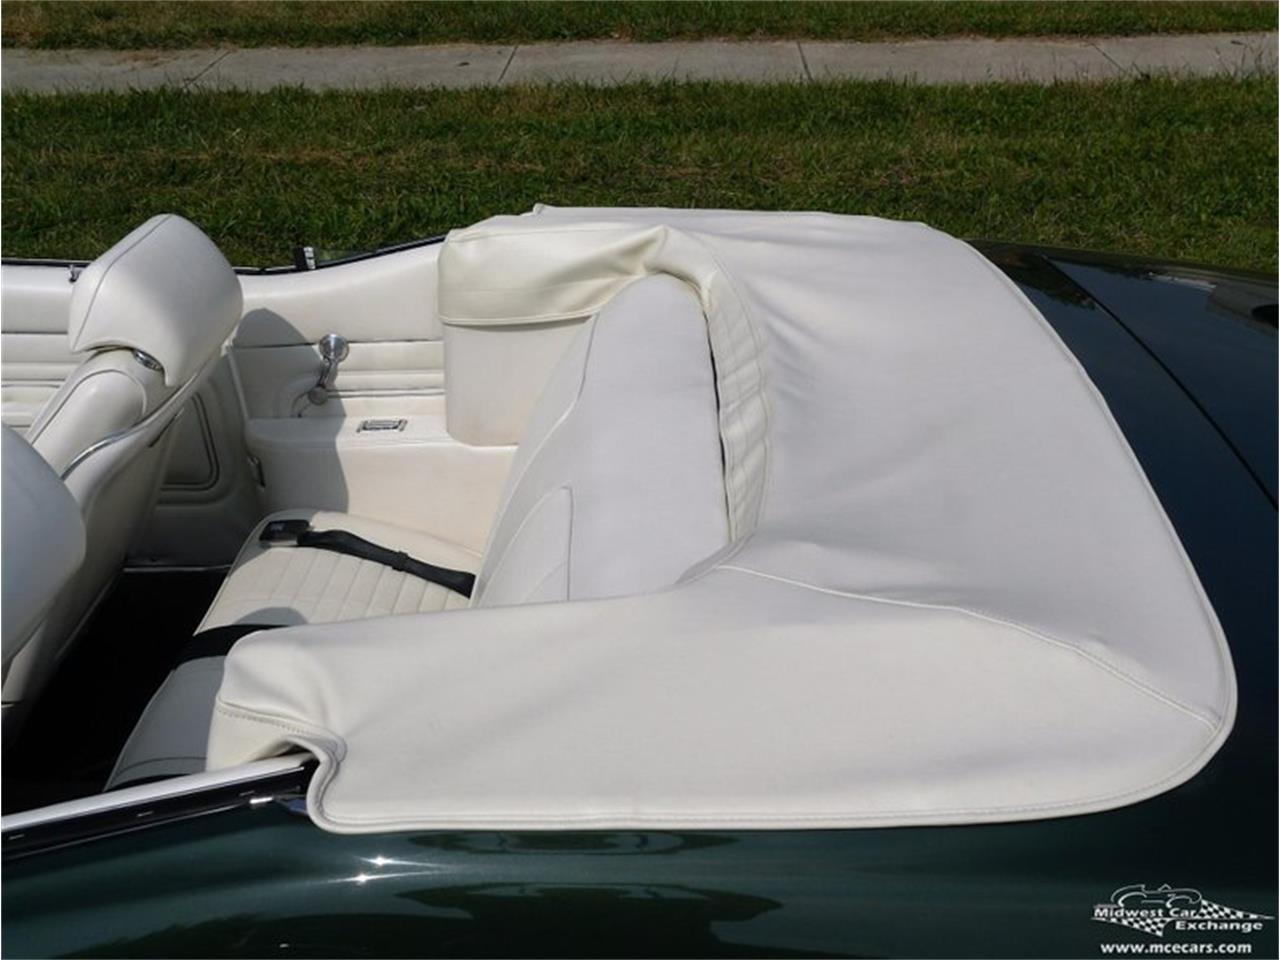 Large Picture of Classic 1971 Pontiac GTO located in Alsip Illinois - $66,900.00 - QAXE